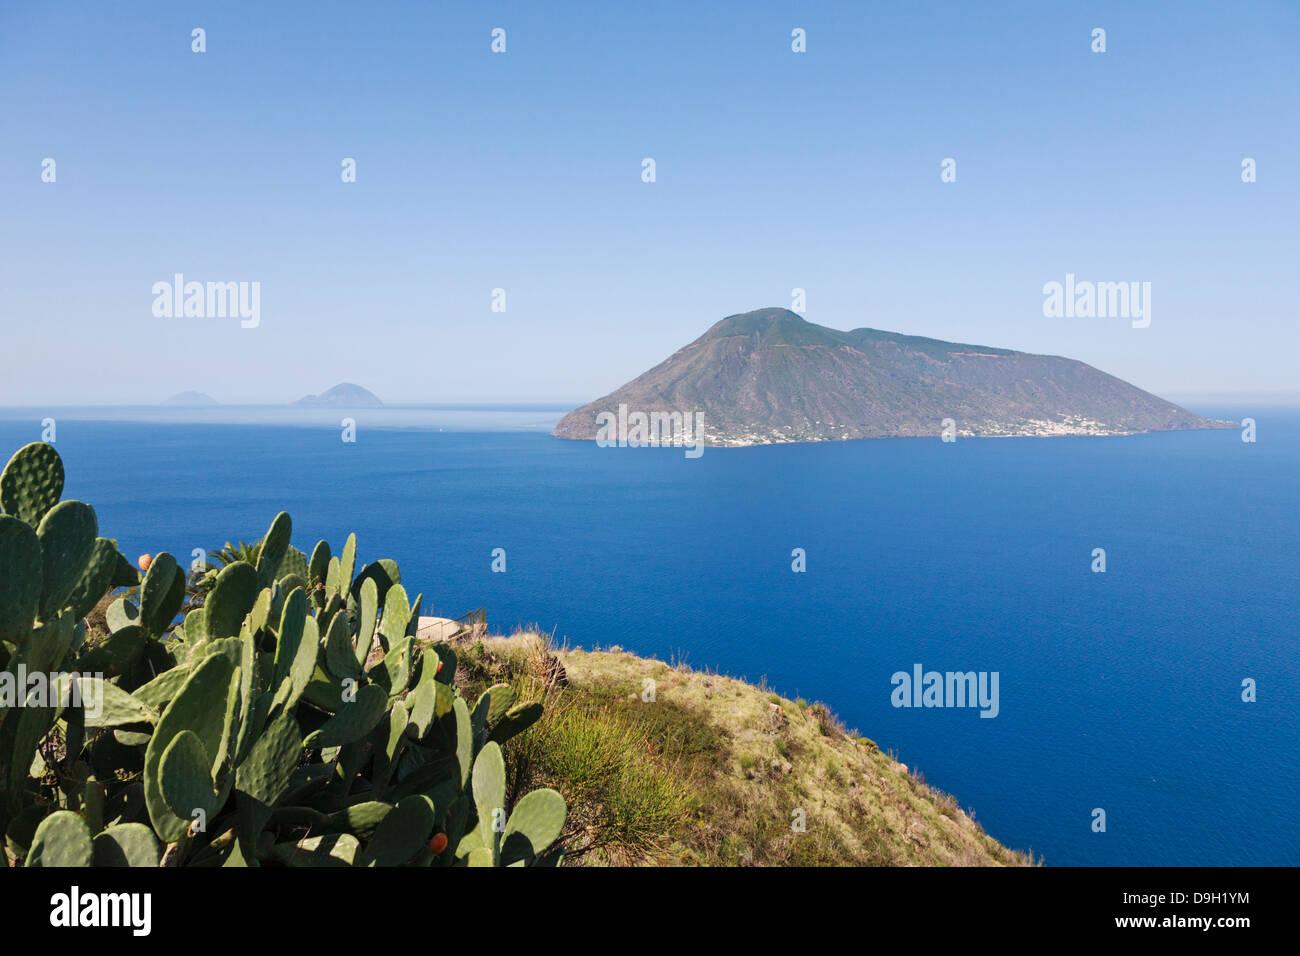 Quattopani viewpoint over Salina, Filicudi and Alicudi far left, Lipari, Aeolian Islands, Italy - Stock Image